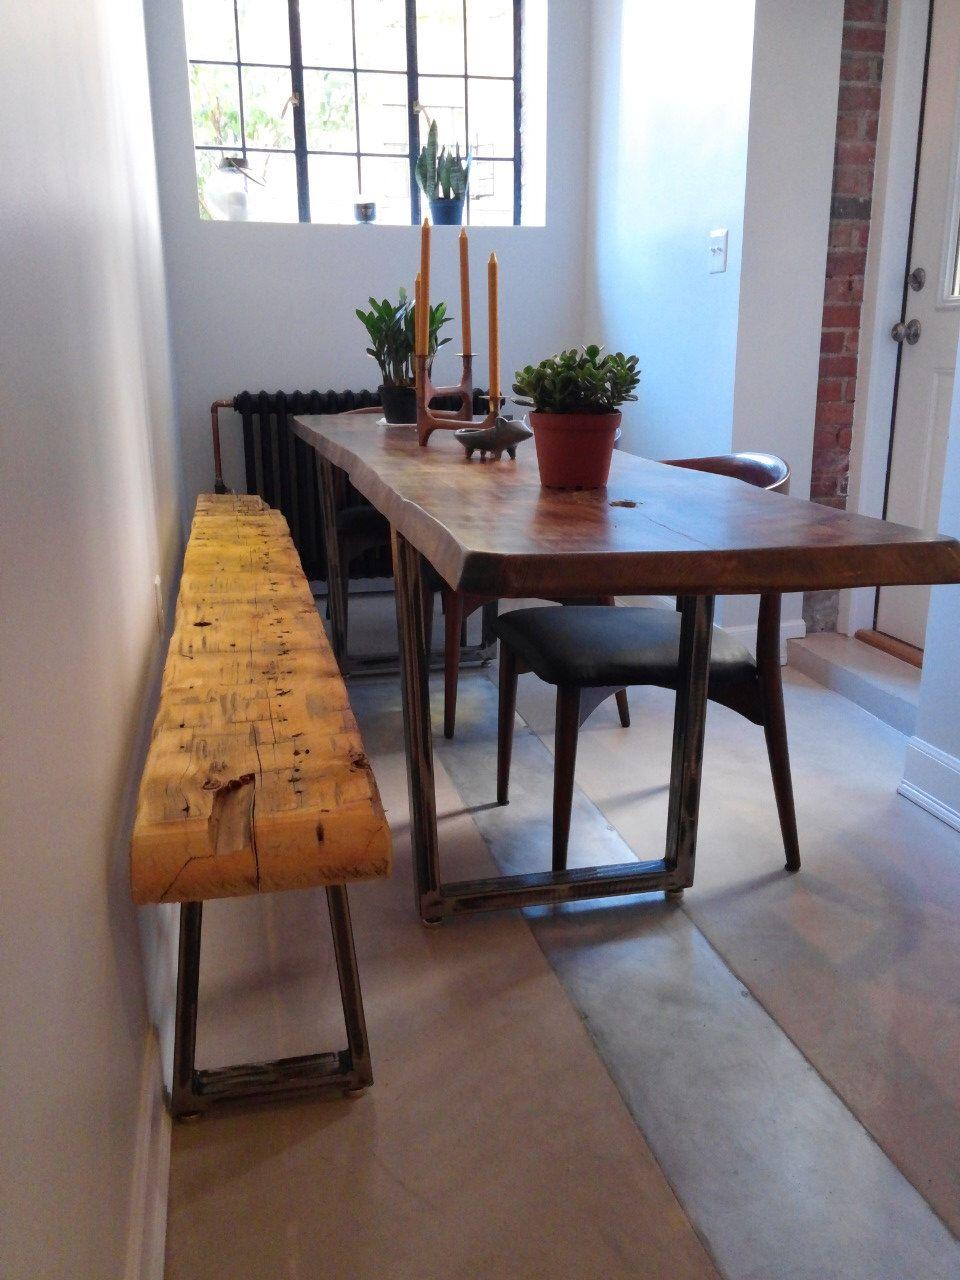 Tapered Steel table legs, metal table legs, bench legs